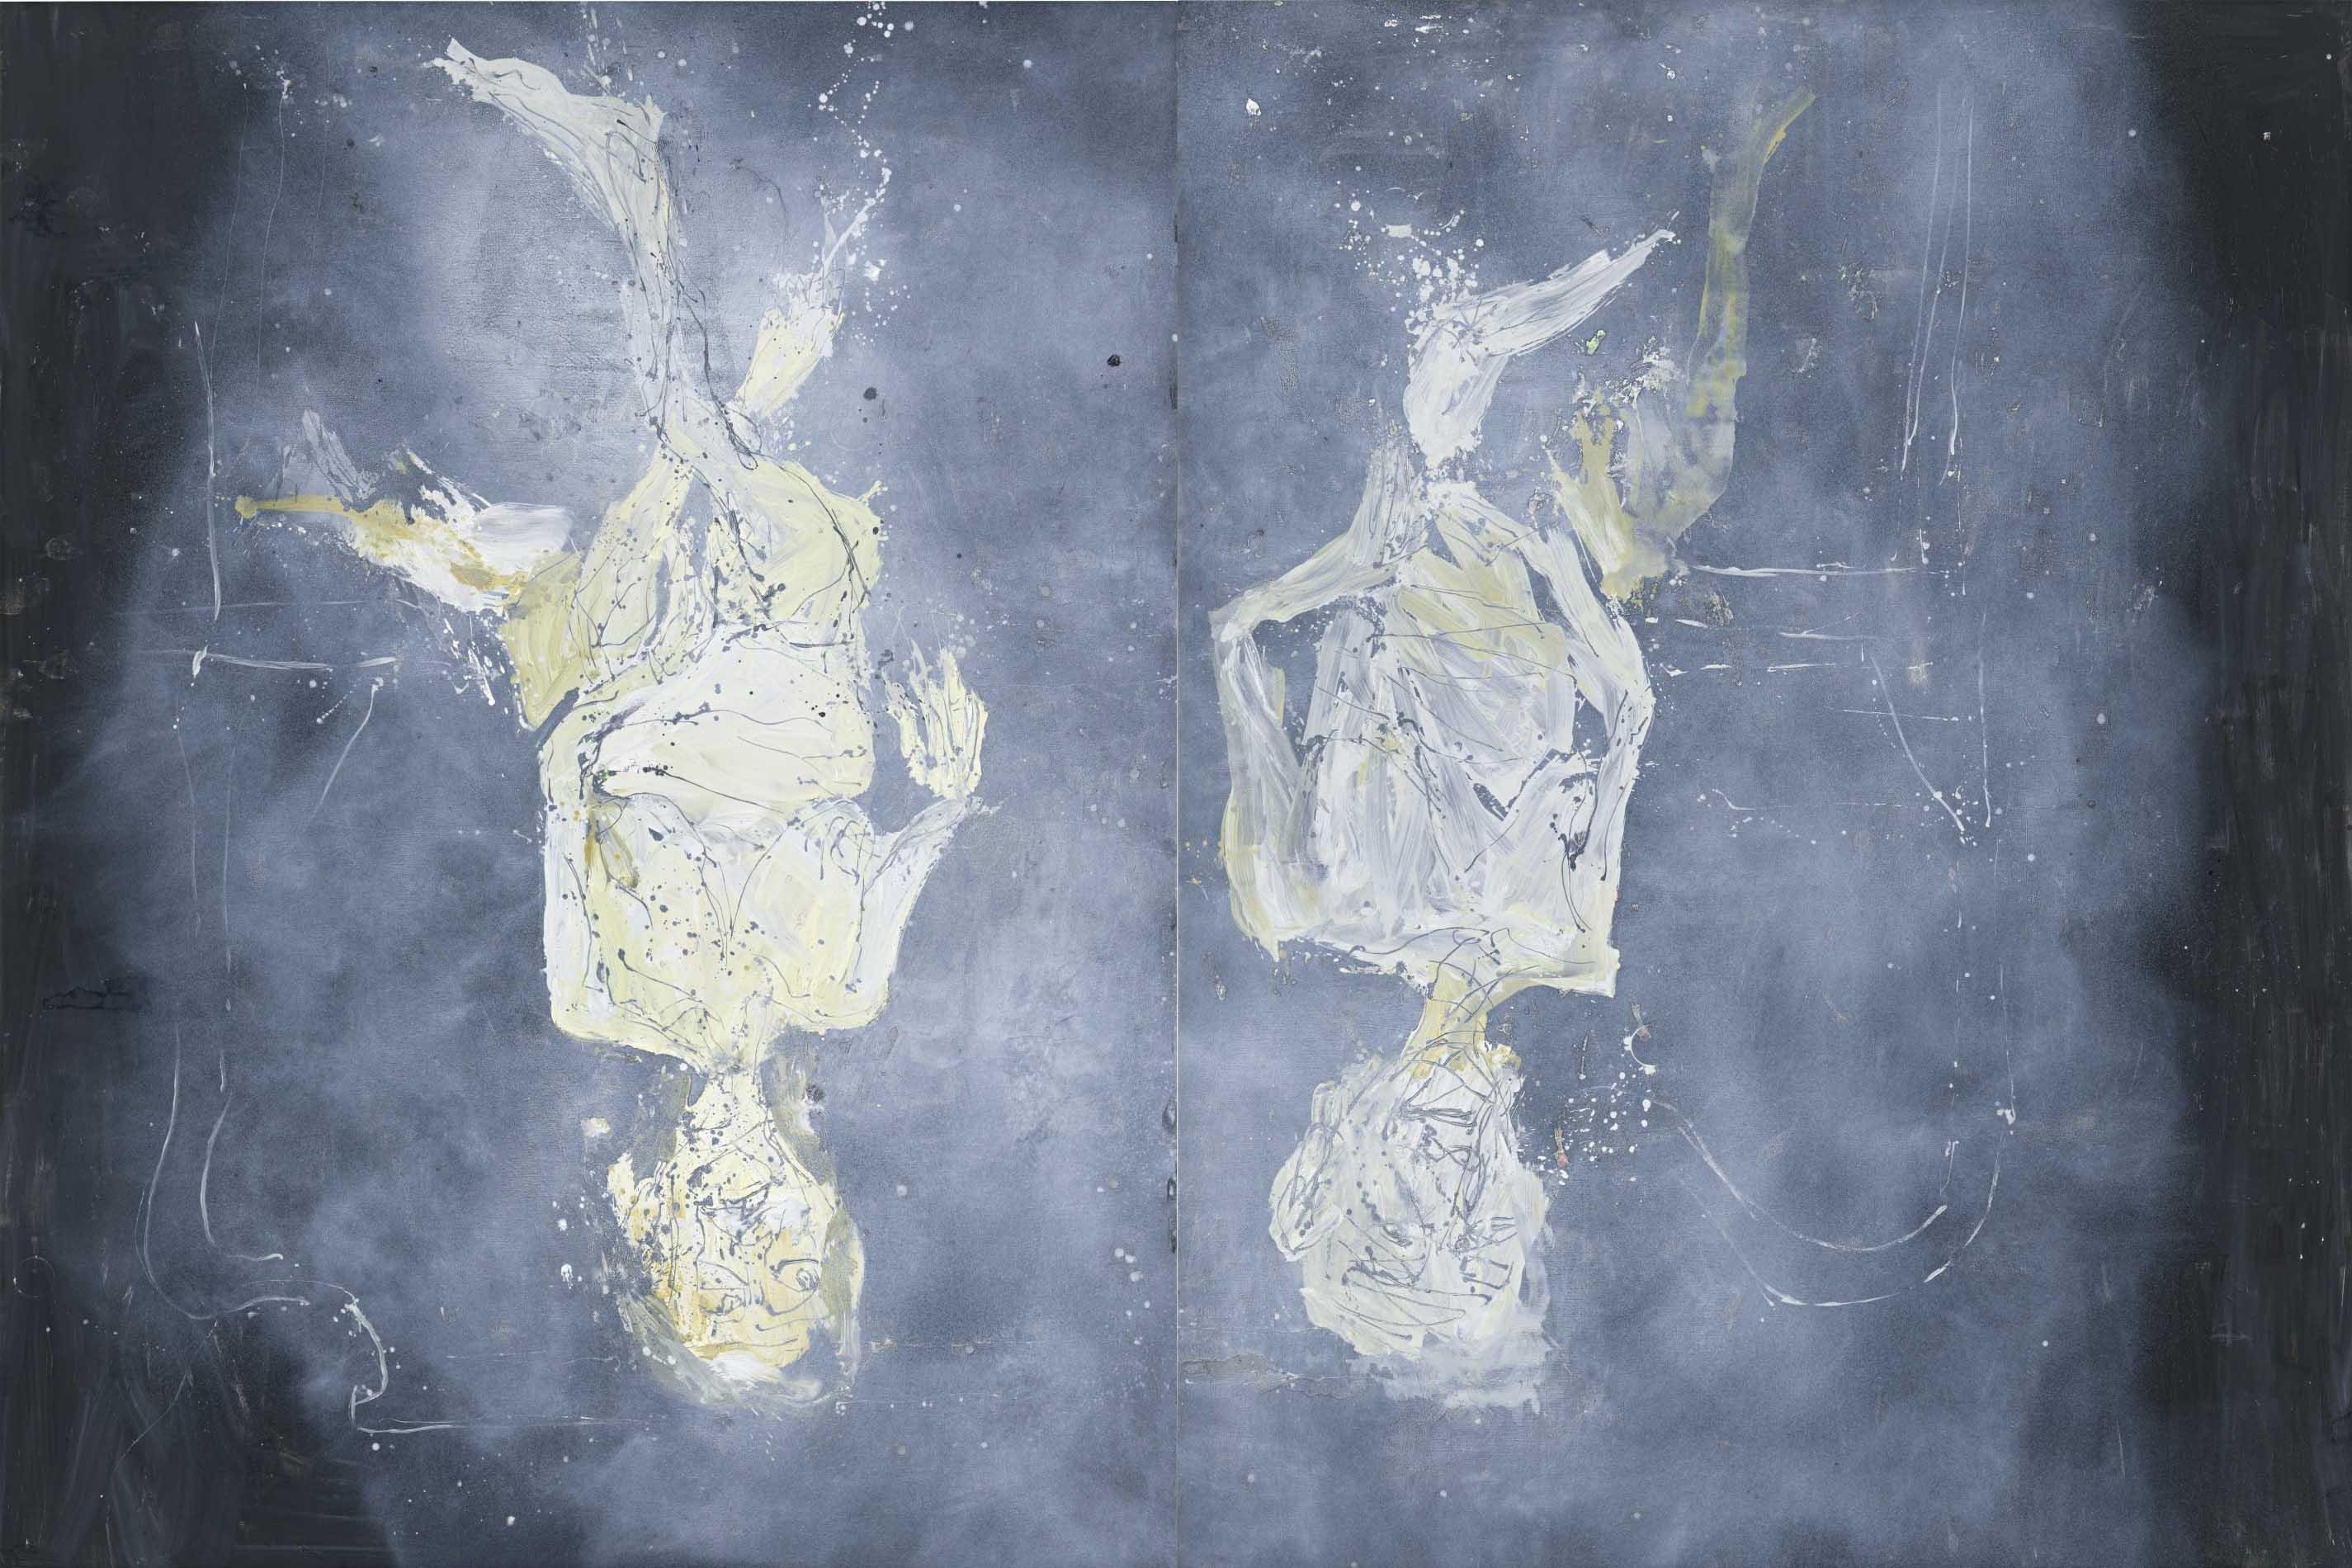 Tableau Georg Baselitz, Dystopische Glocken (2015)